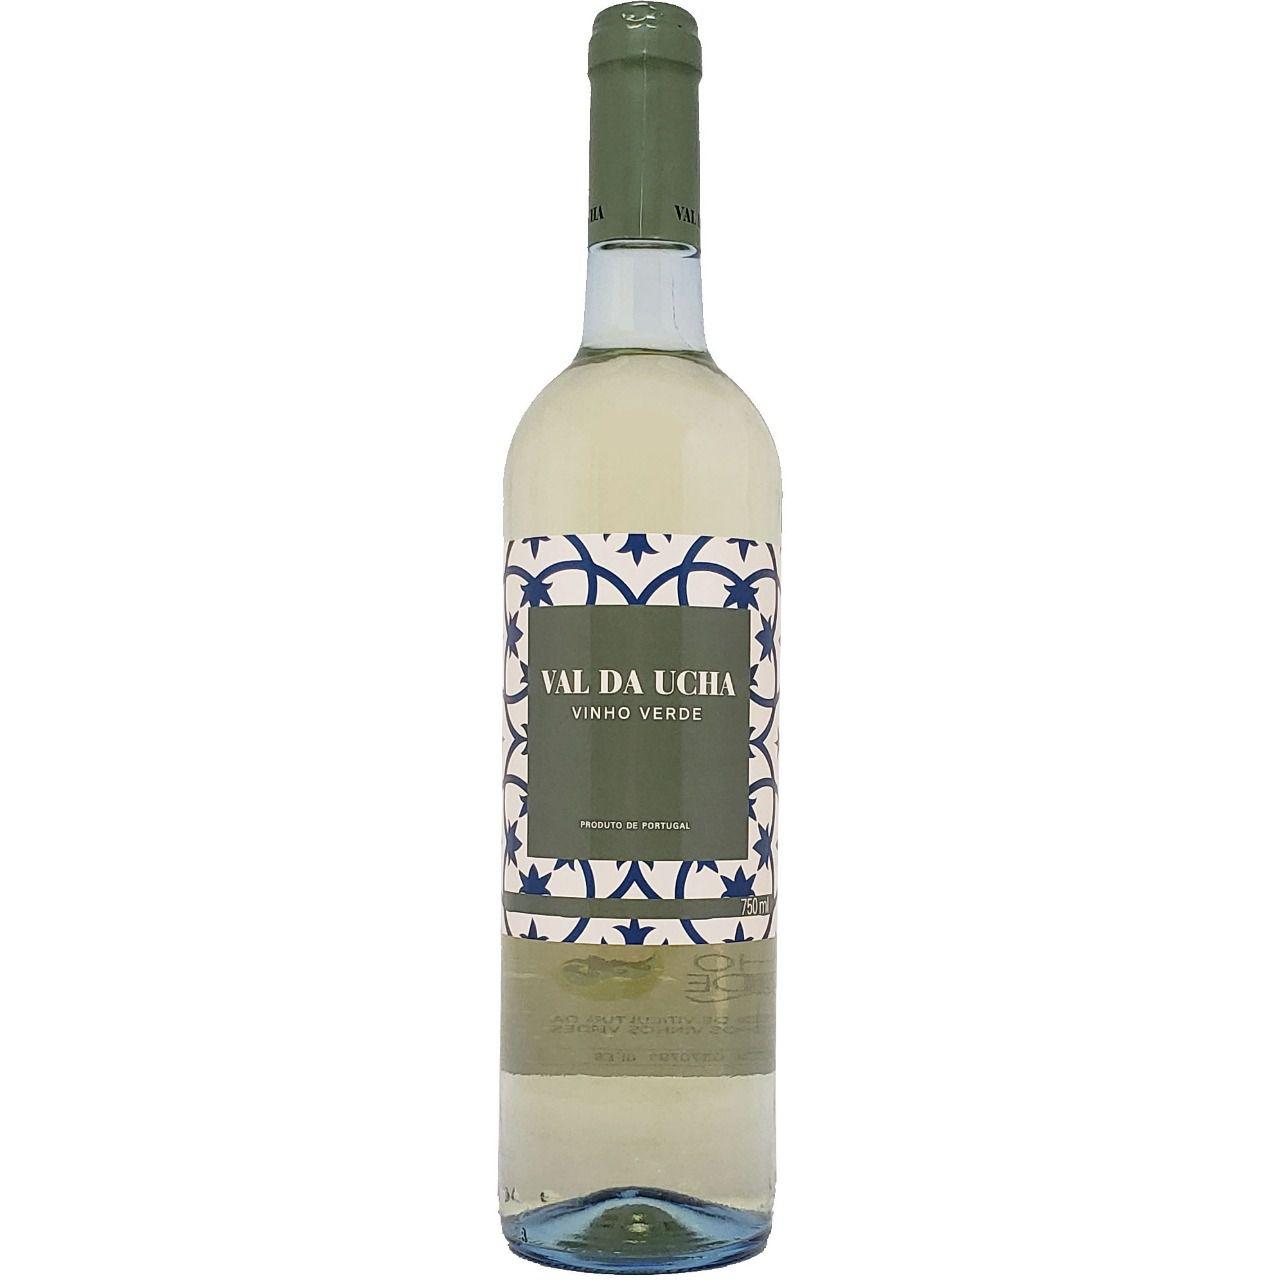 Vinho Verde Val da Ucha - 750ml -